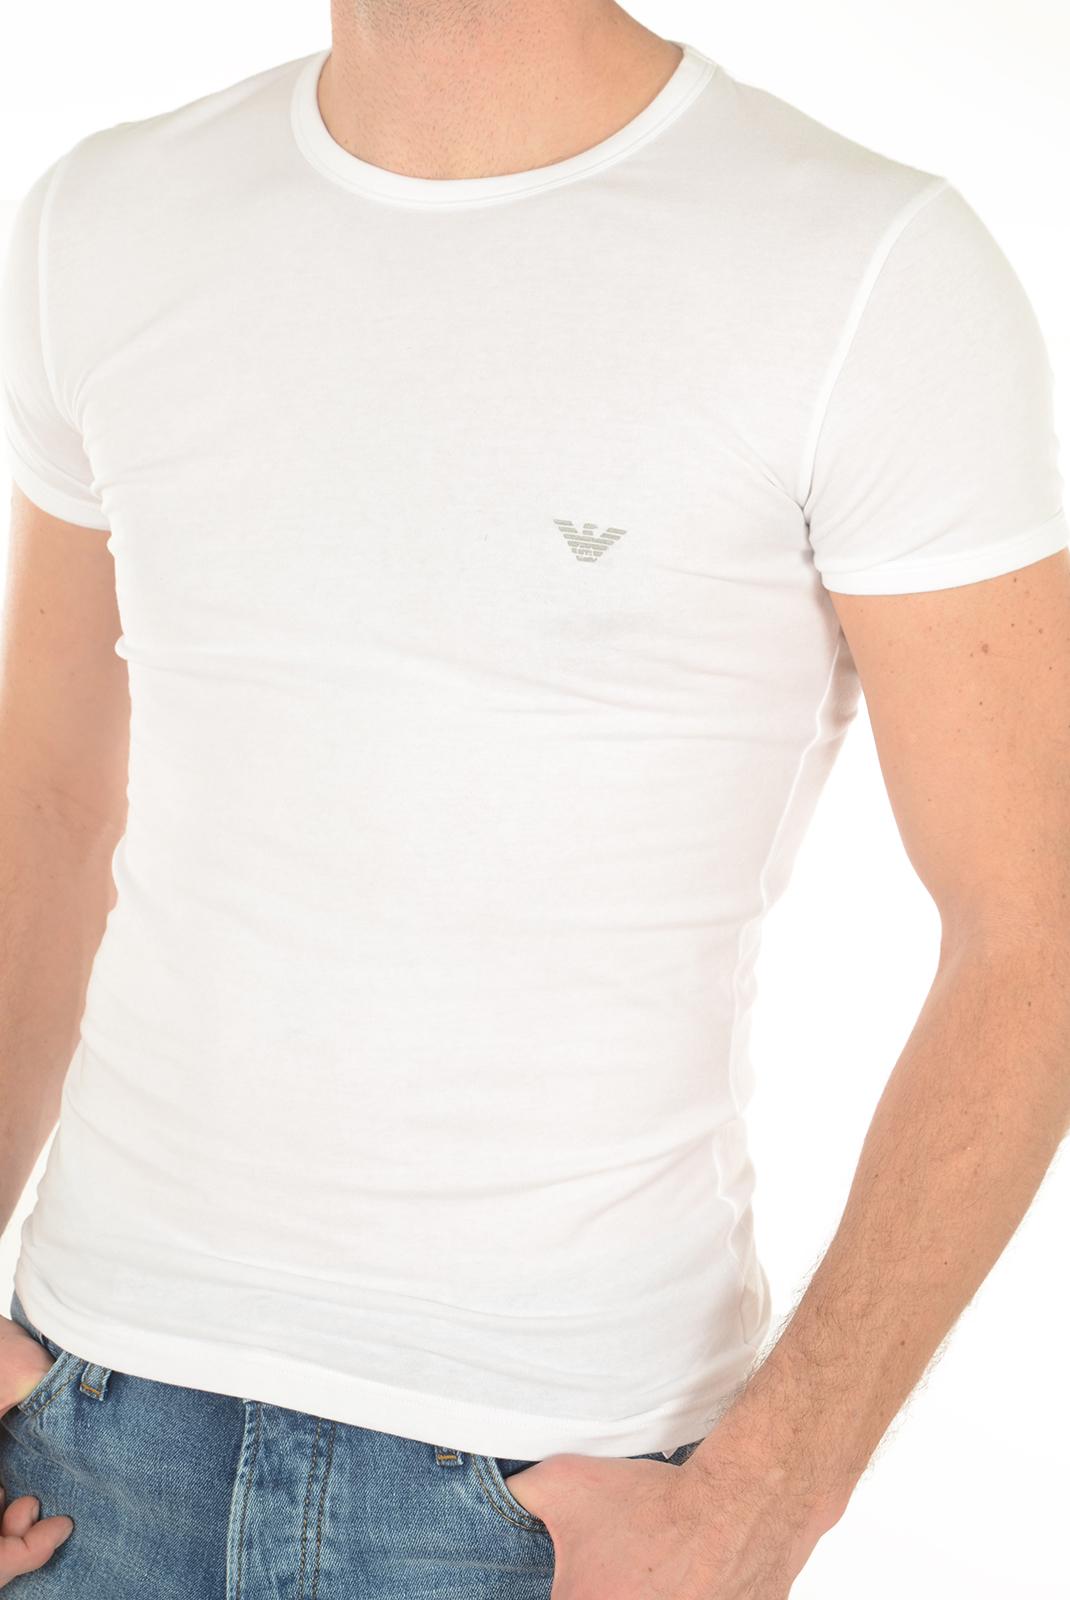 Tee-shirts manches courtes  Emporio armani 111035 6A725 010 BLANC